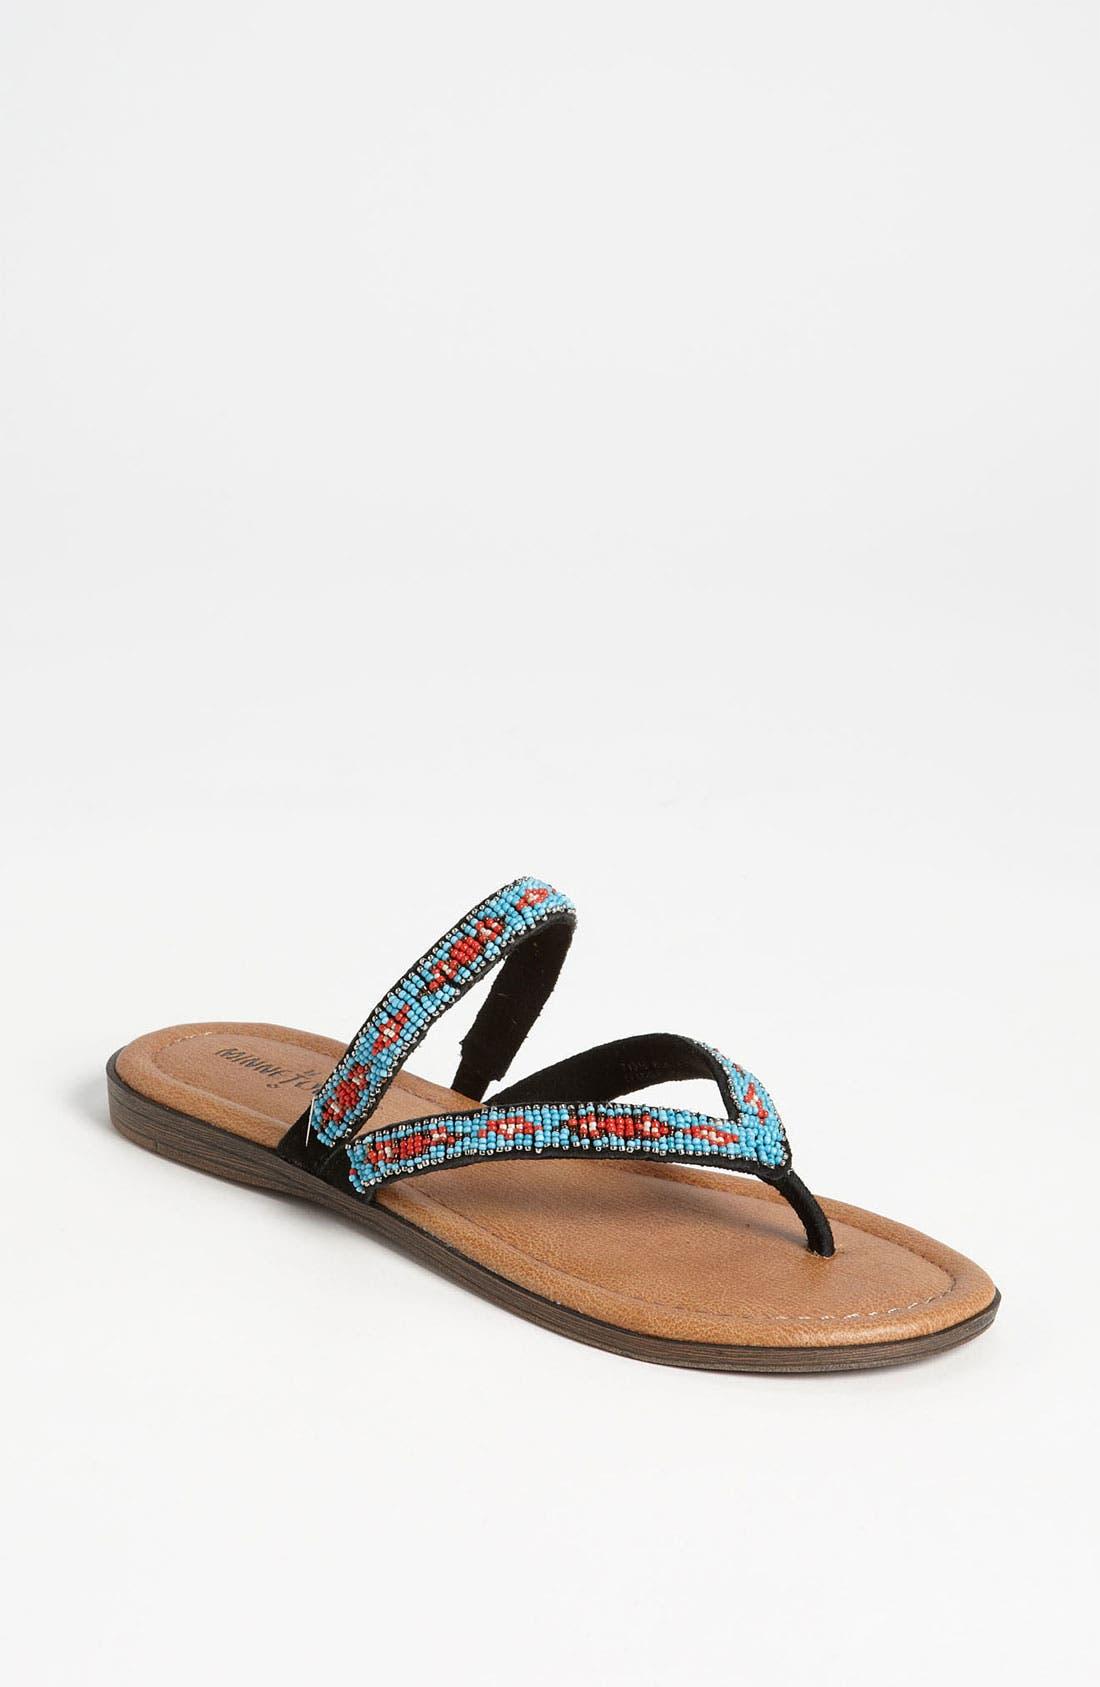 Main Image - Minnetonka 'Bermuda' Sandal